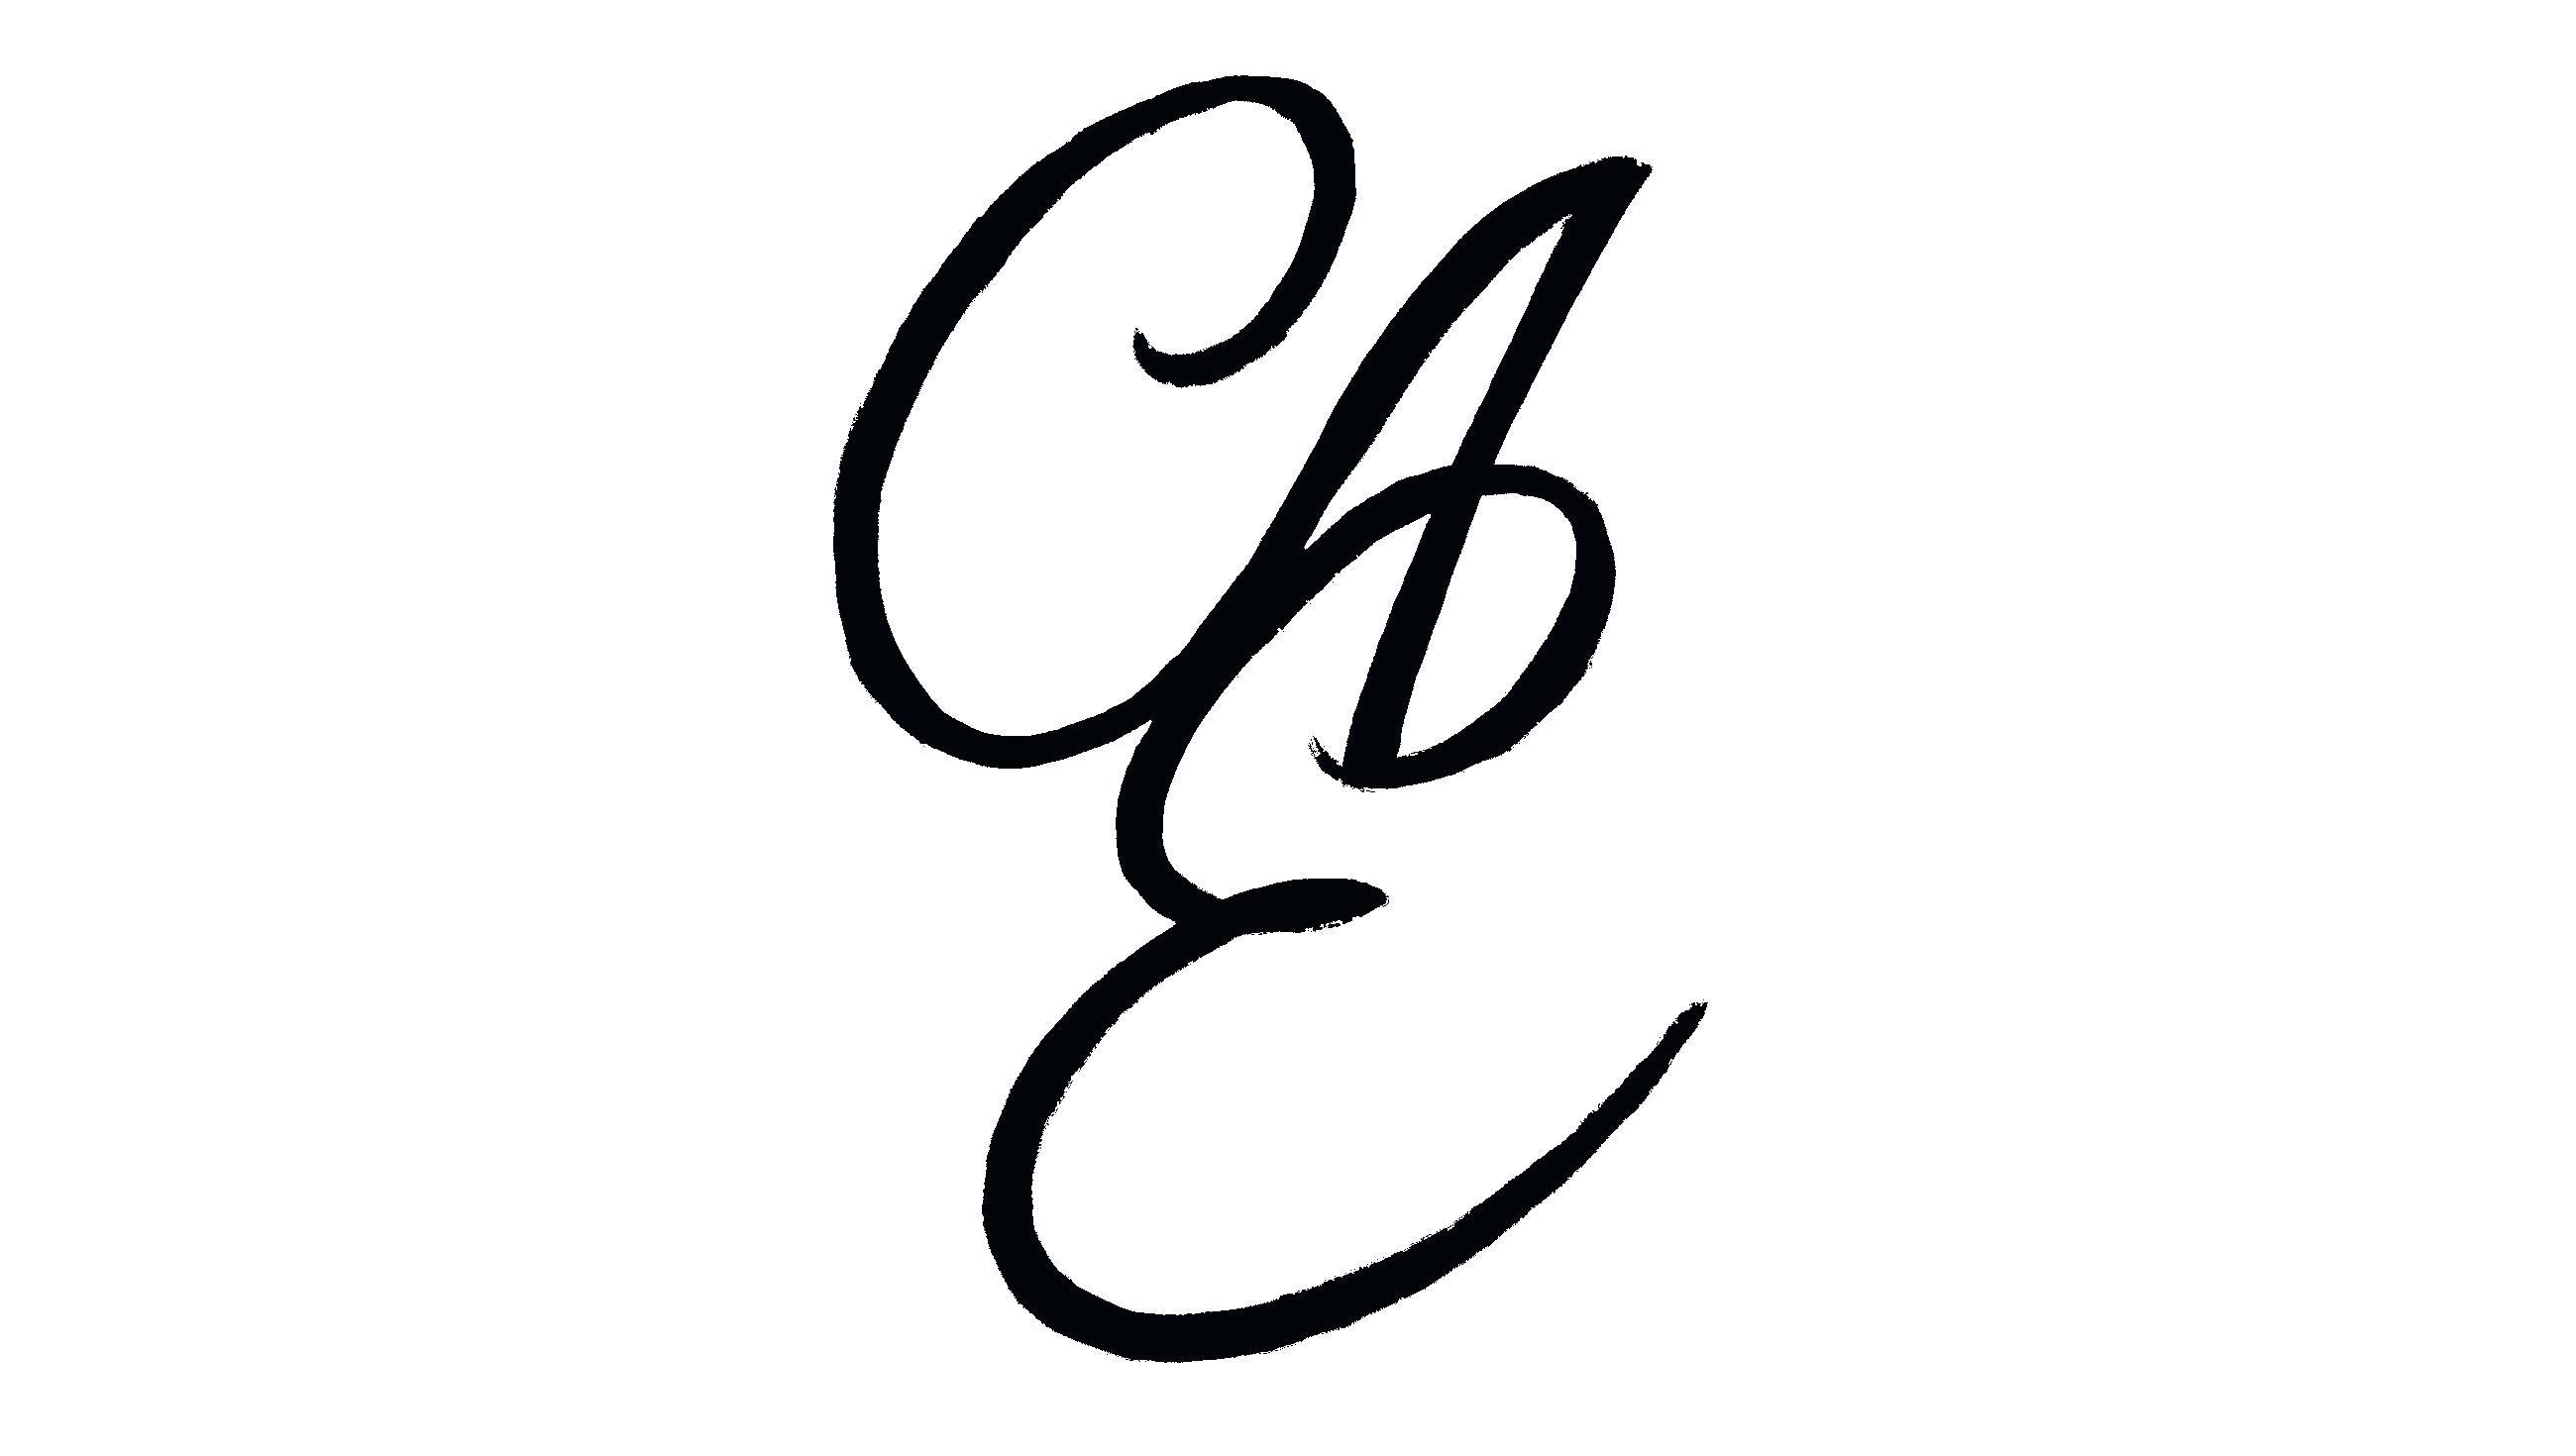 Cheri Ann's Signature